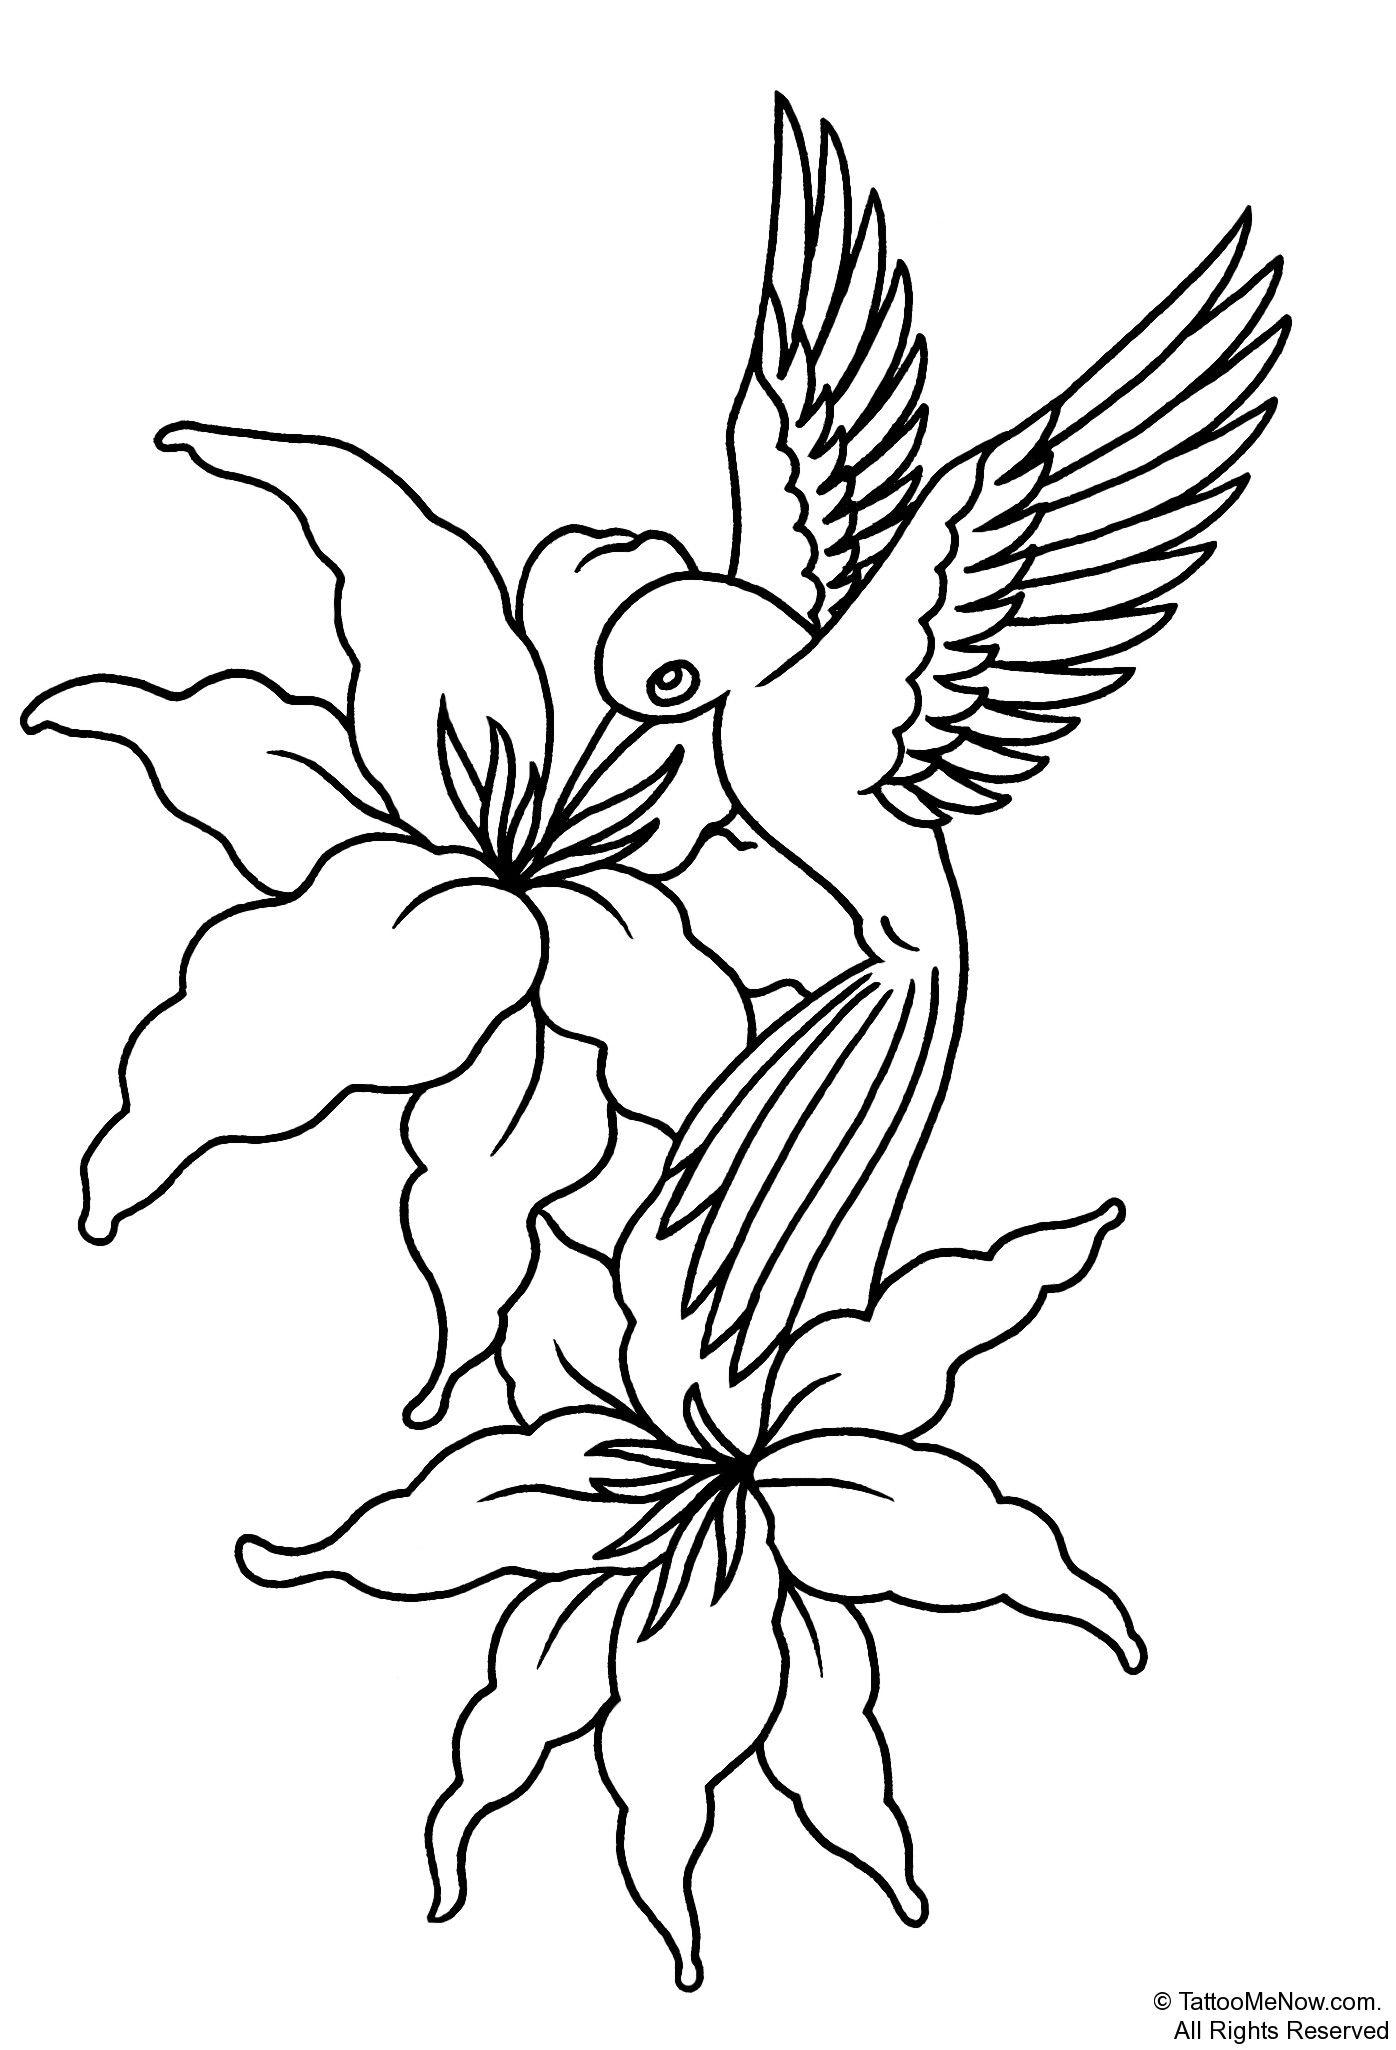 Free Printable Tattoo Stencils   Your Free Tattoo Designs & Stencils - Free Printable Tattoo Flash